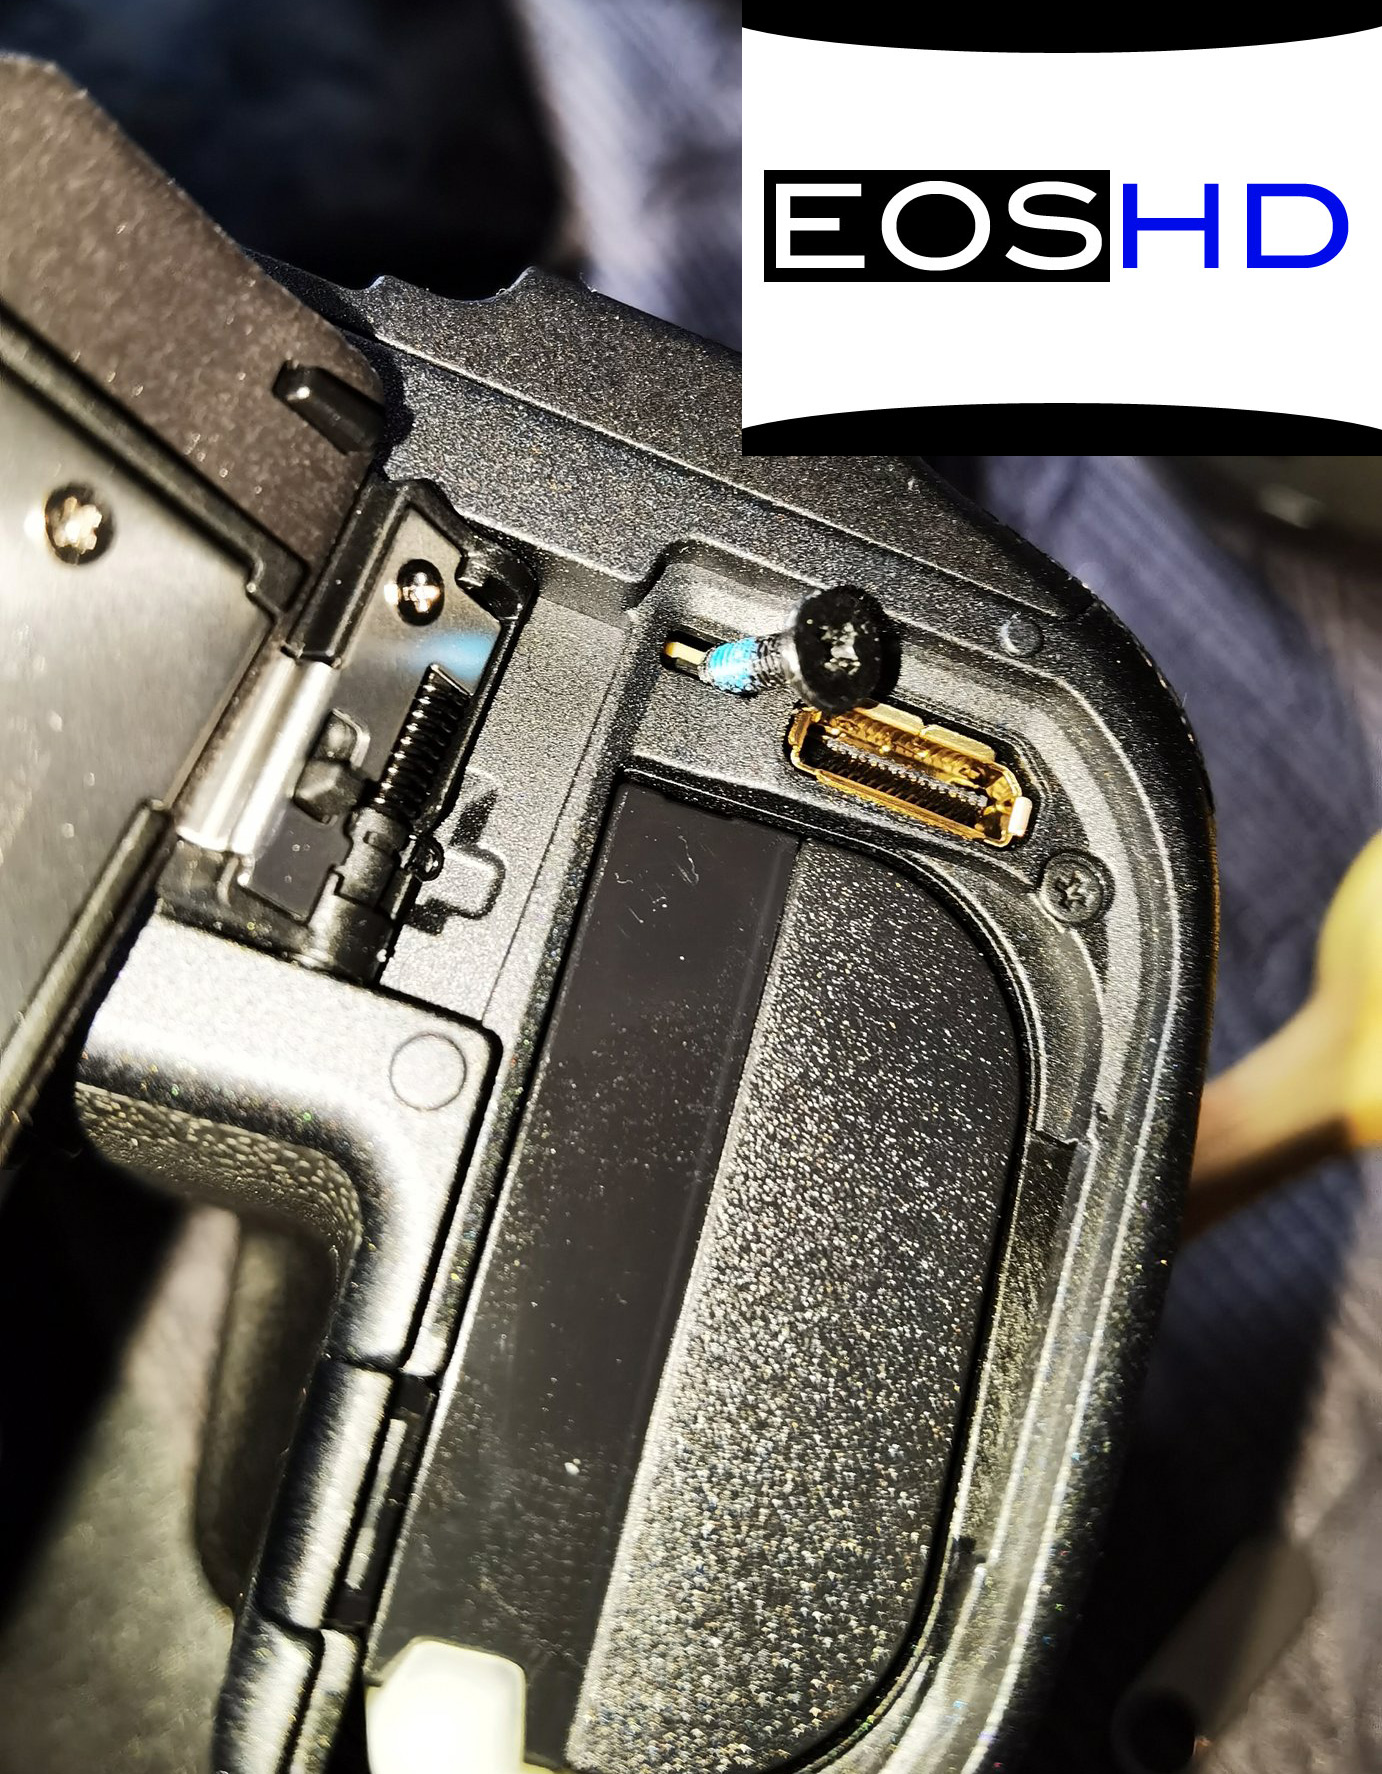 www.eoshd.com